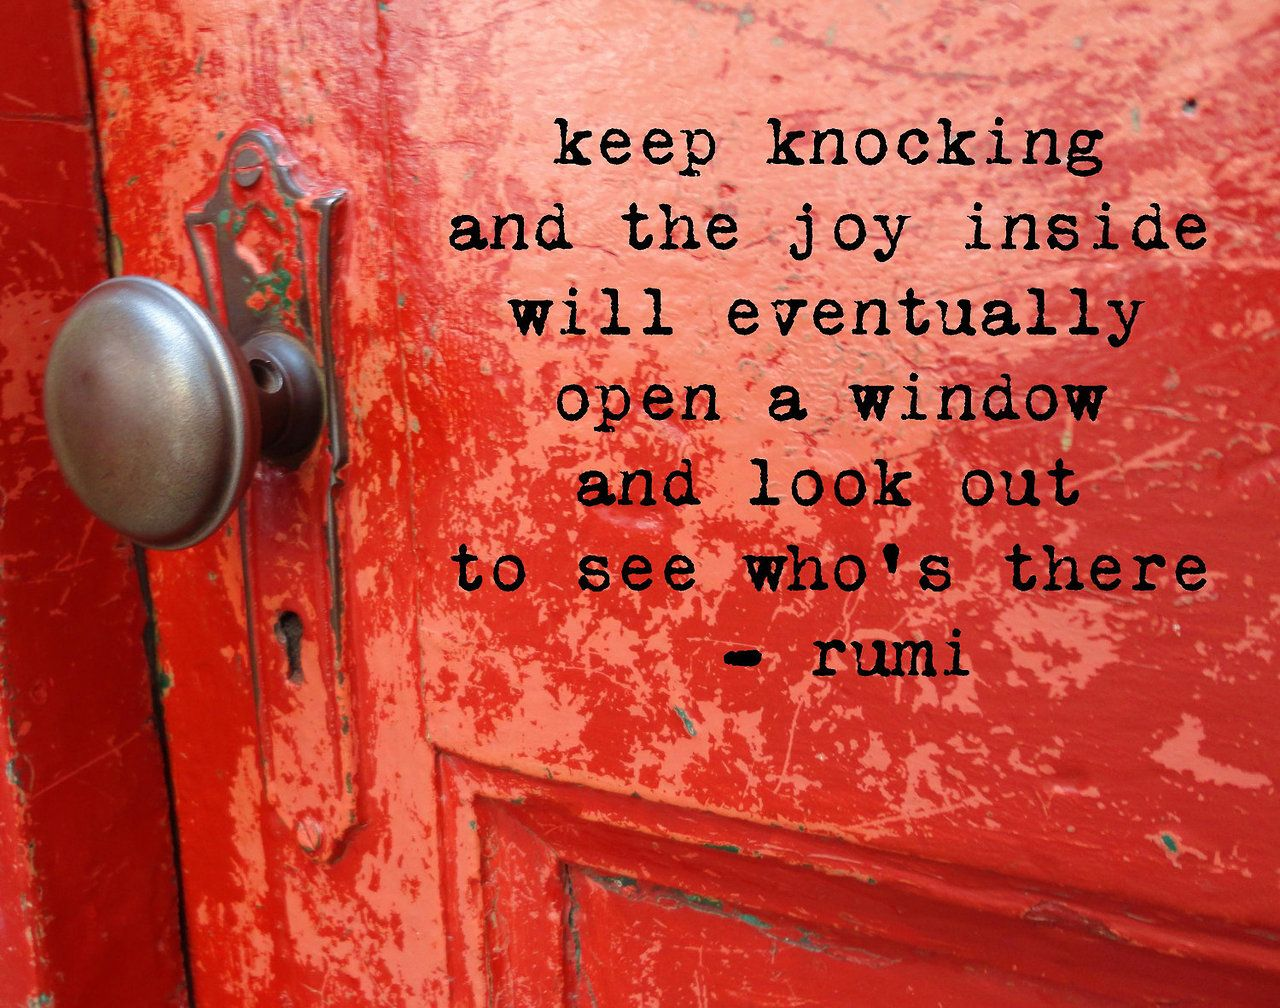 Keeping knocking Rumi quote wisdom life